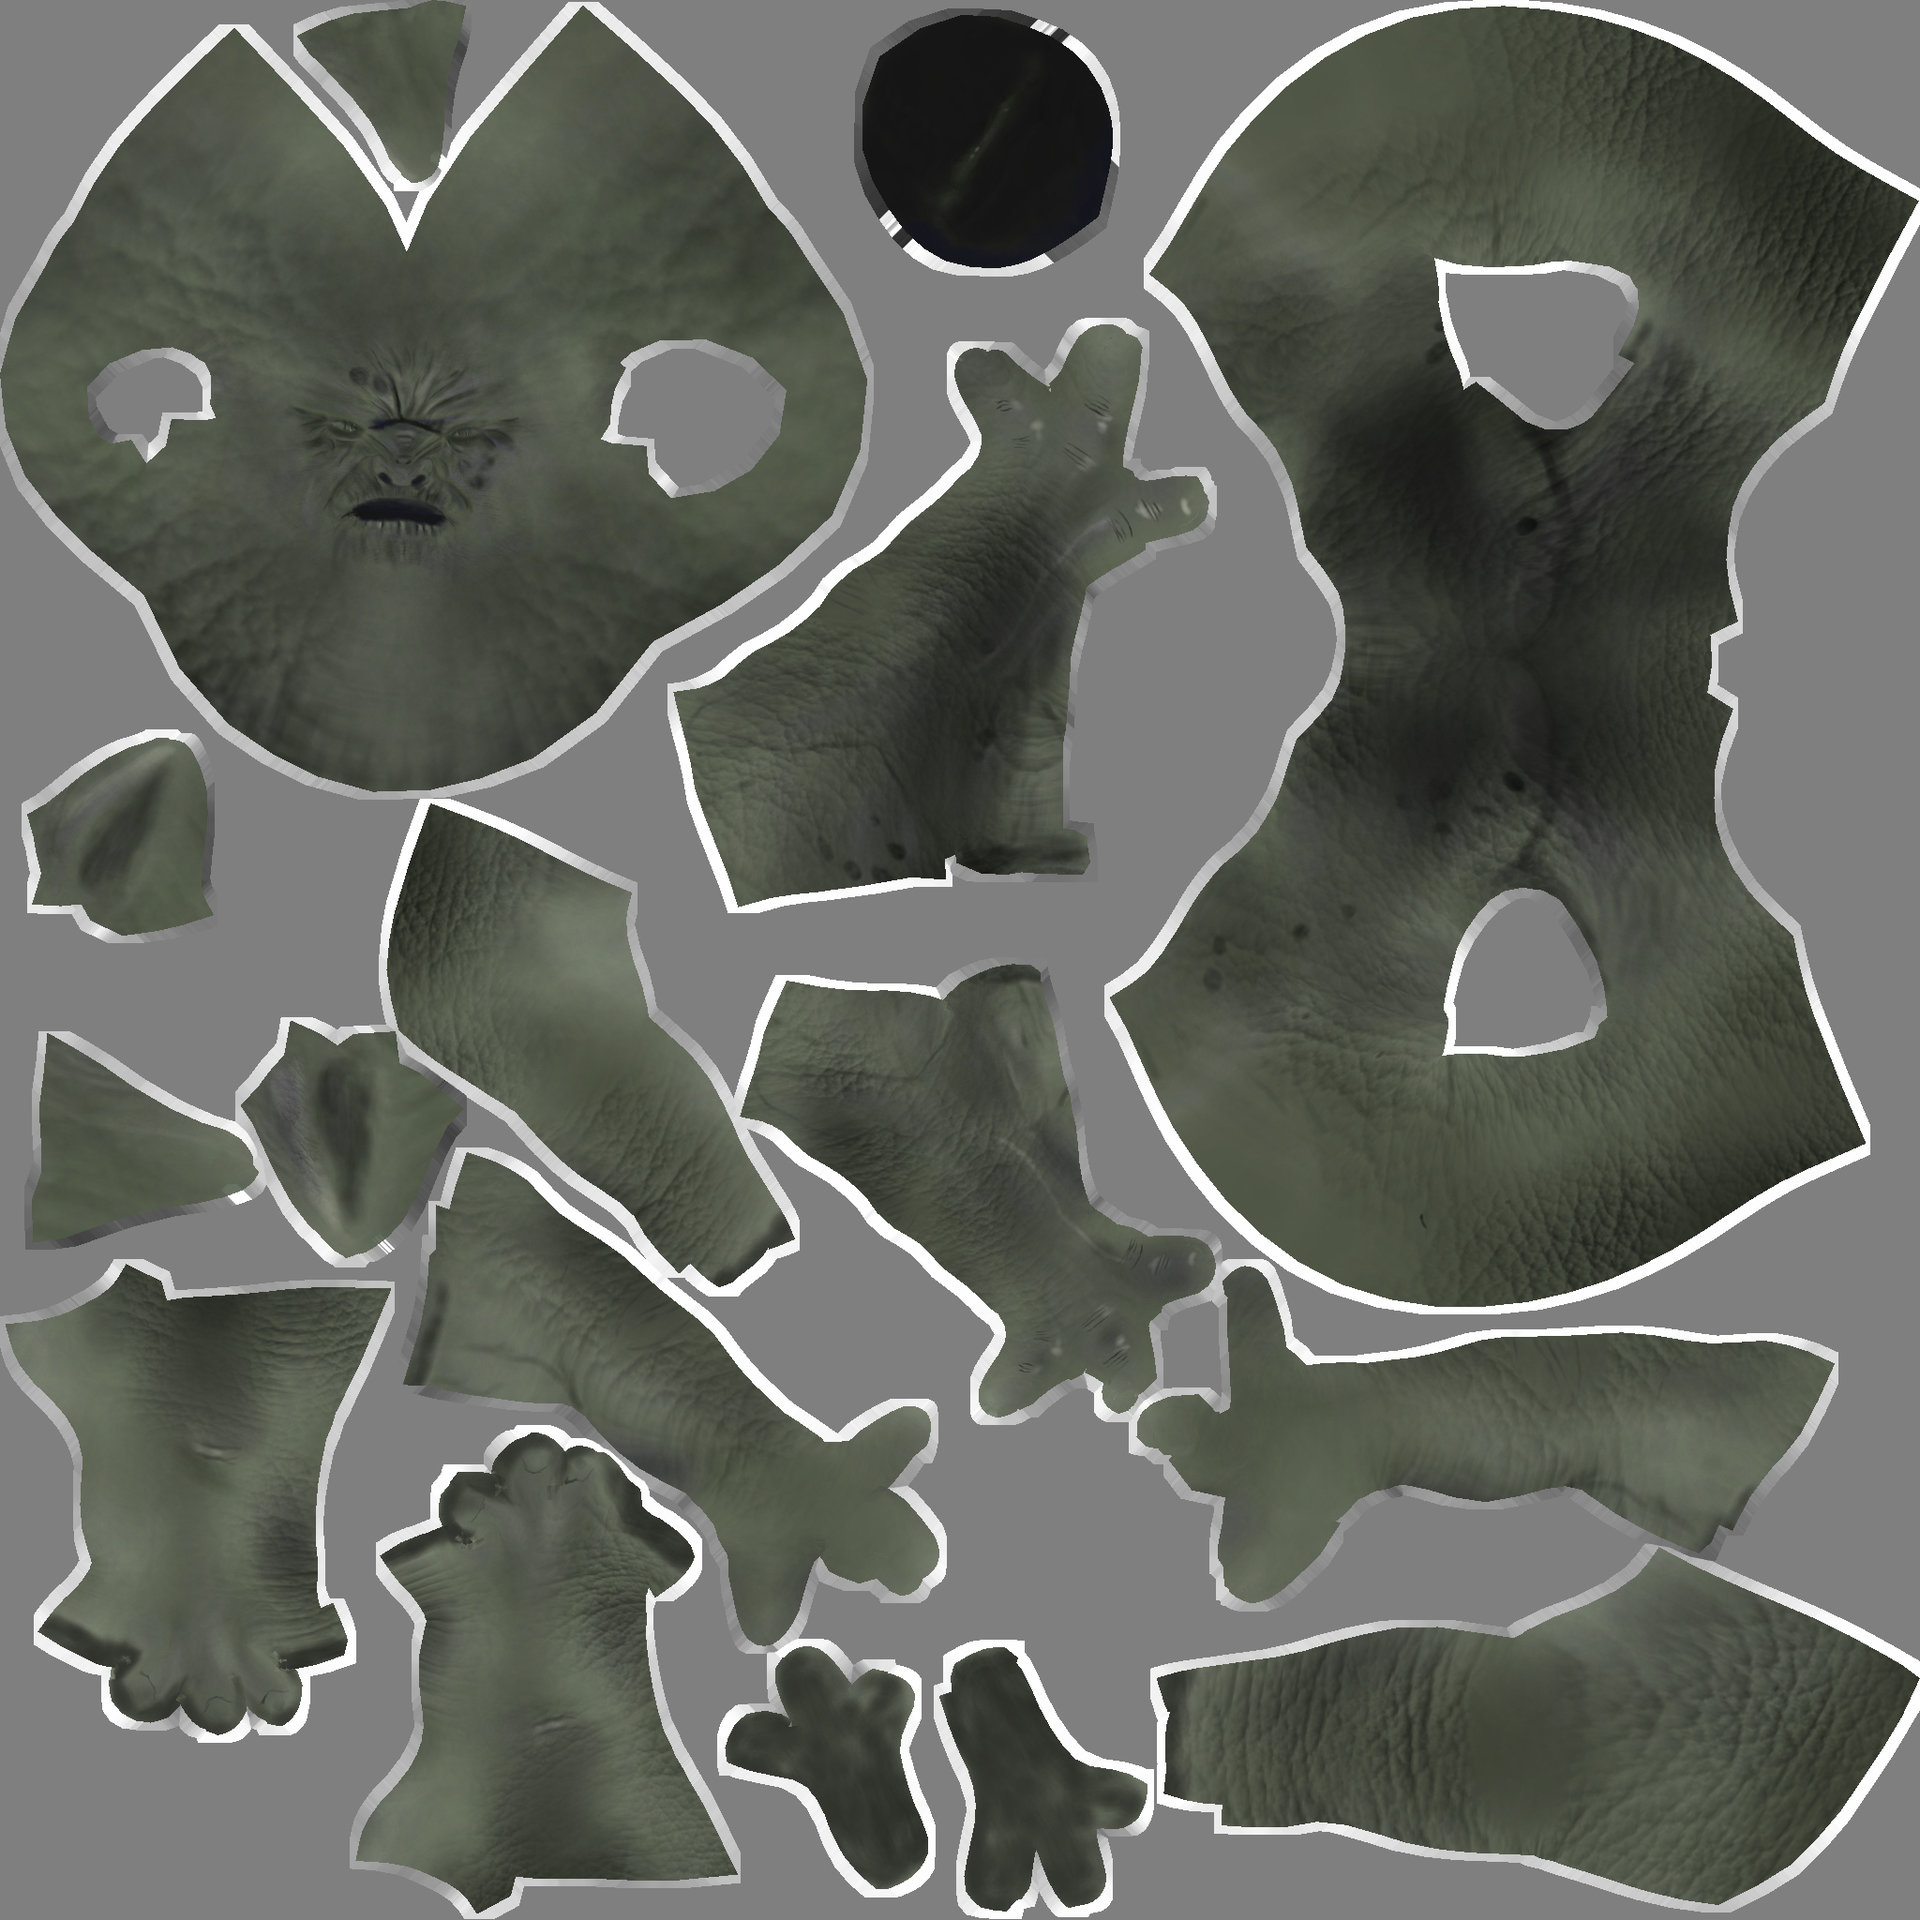 Tomislav veg tijelo texture map